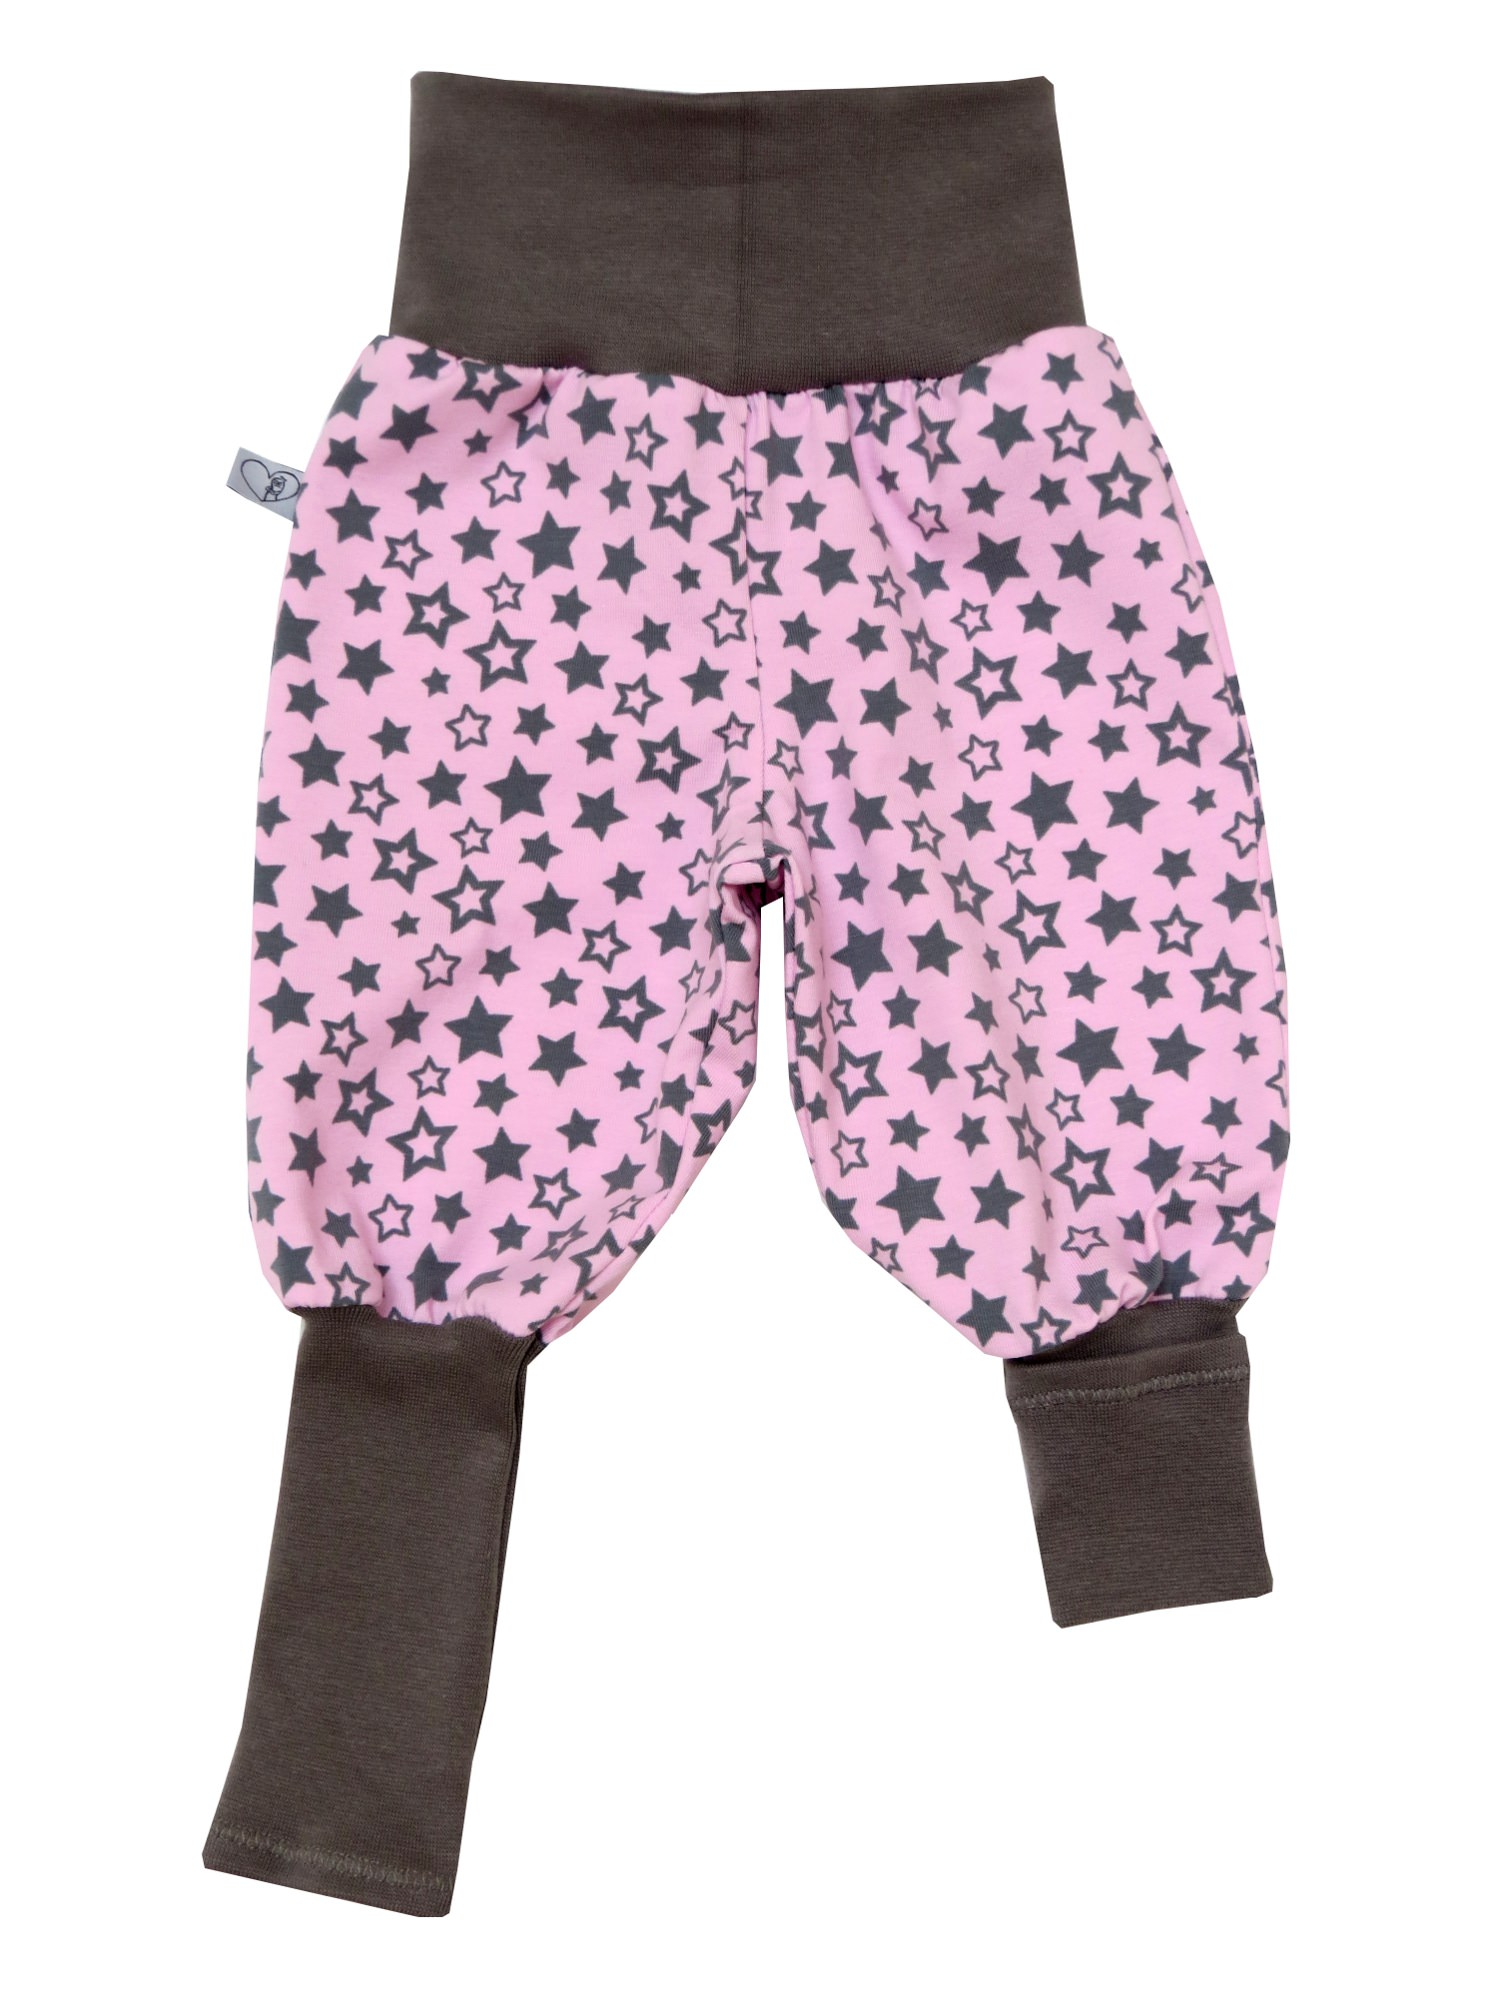 Kleinesbild - Mitwachshose Sterne Hose Pumphose rosa grau Babyhose